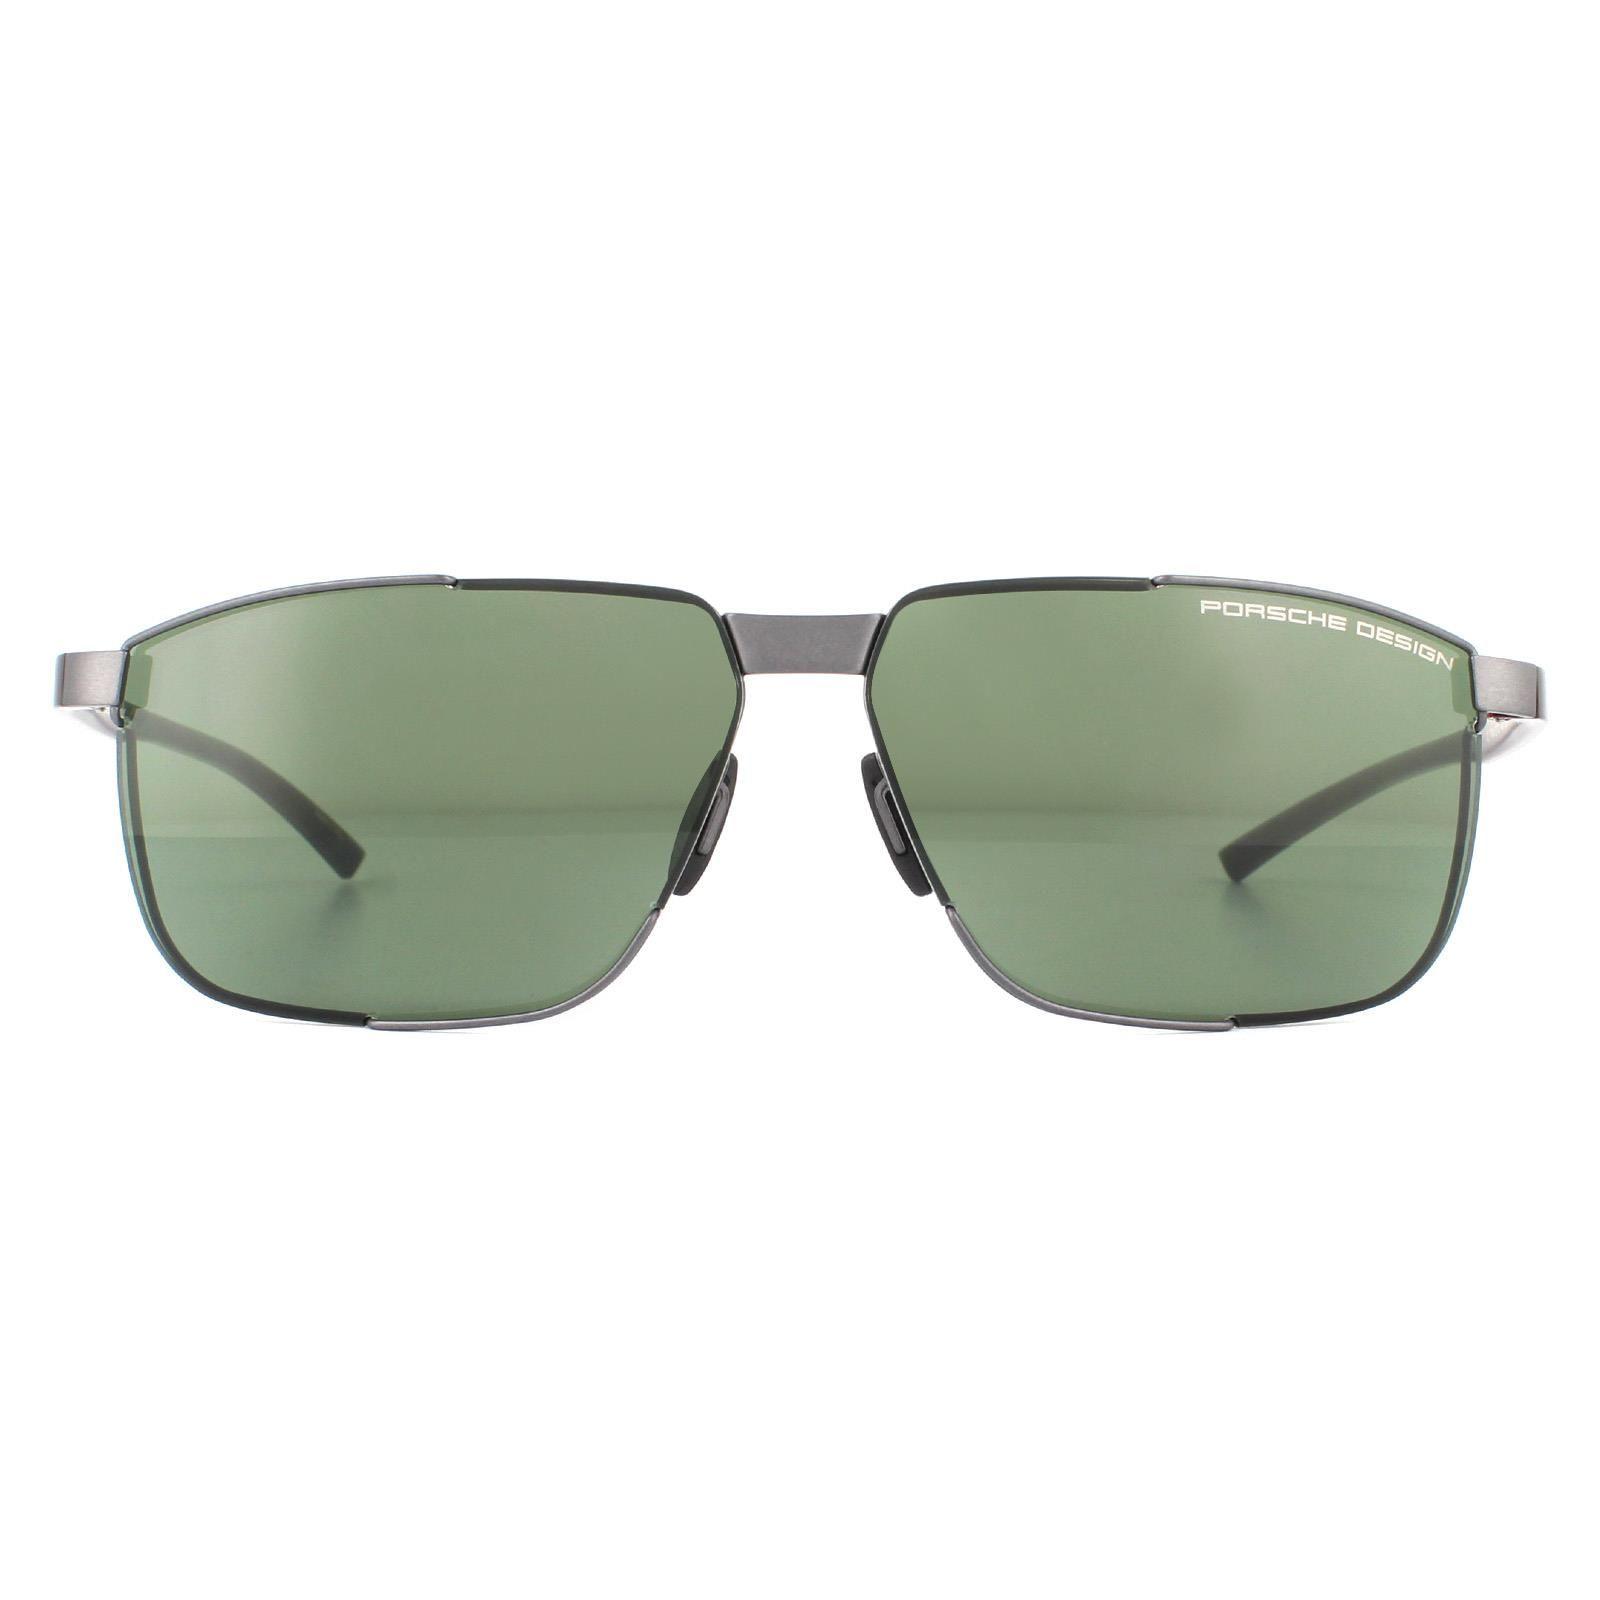 Porsche Design Sunglasses P8680 C Dark Gunmetal Green